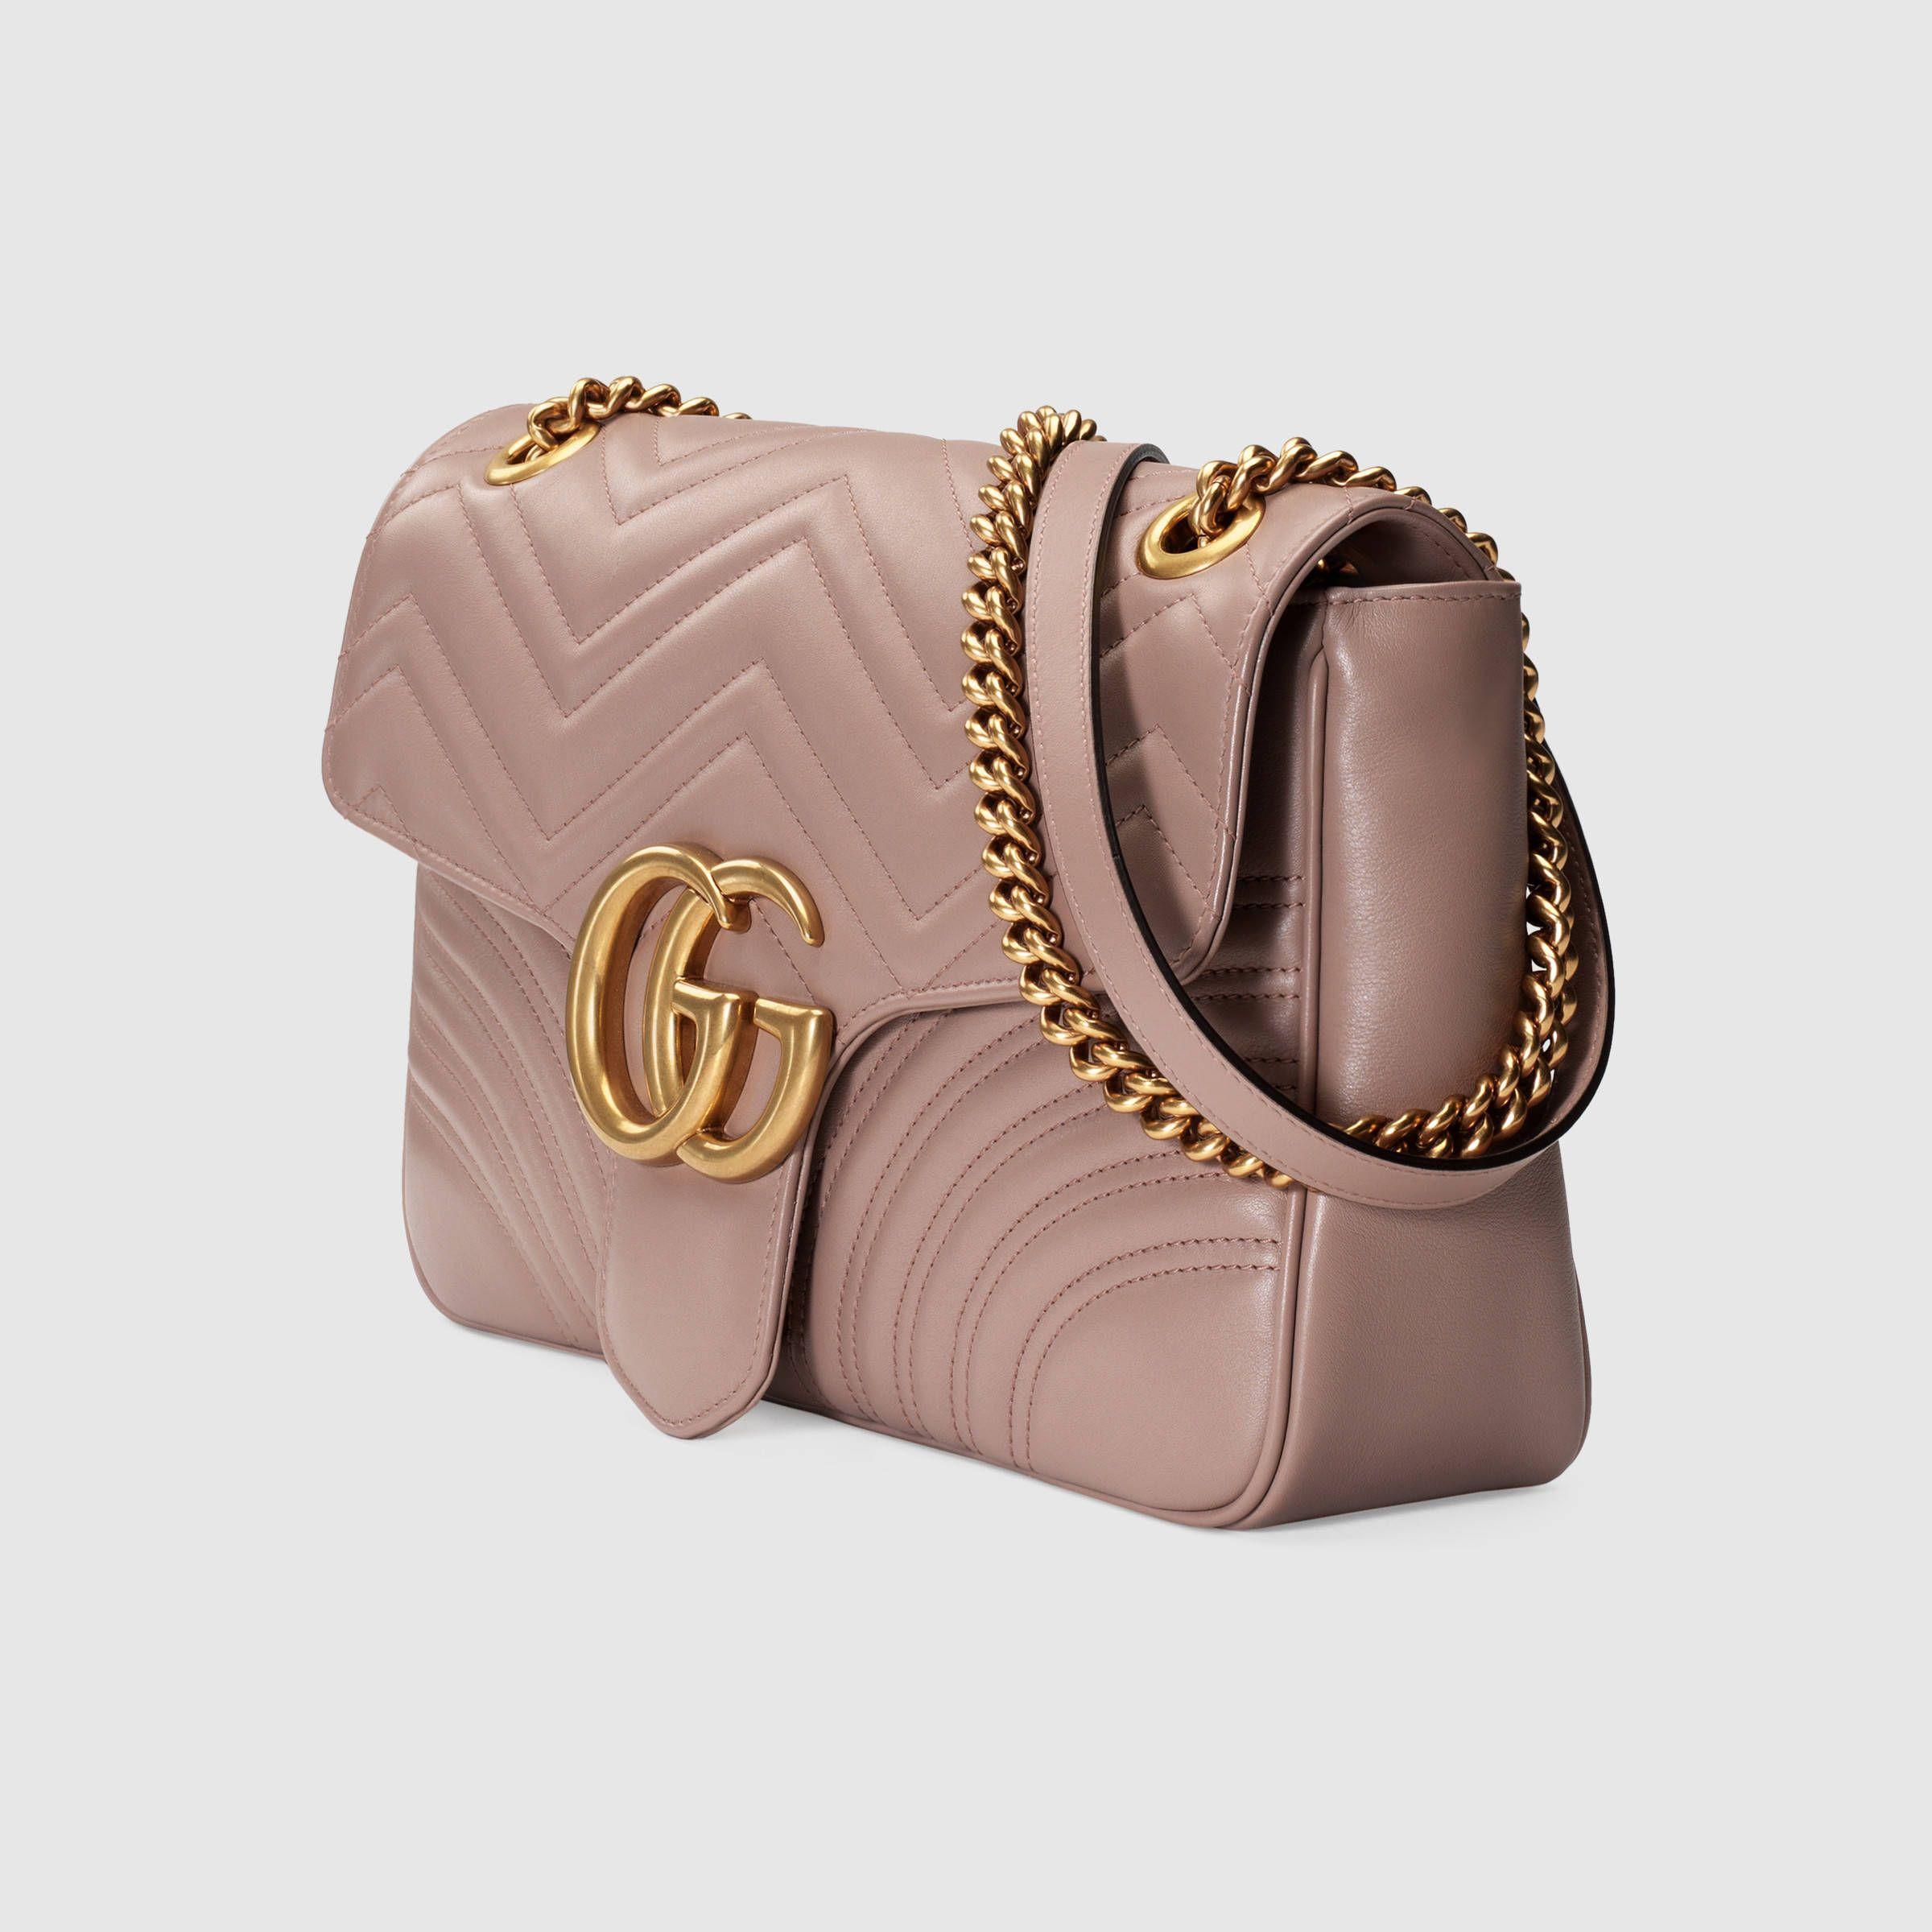 4abe252e8f3496 GG Marmont medium matelassé shoulder bag | Handbags | Bags, Chain ...